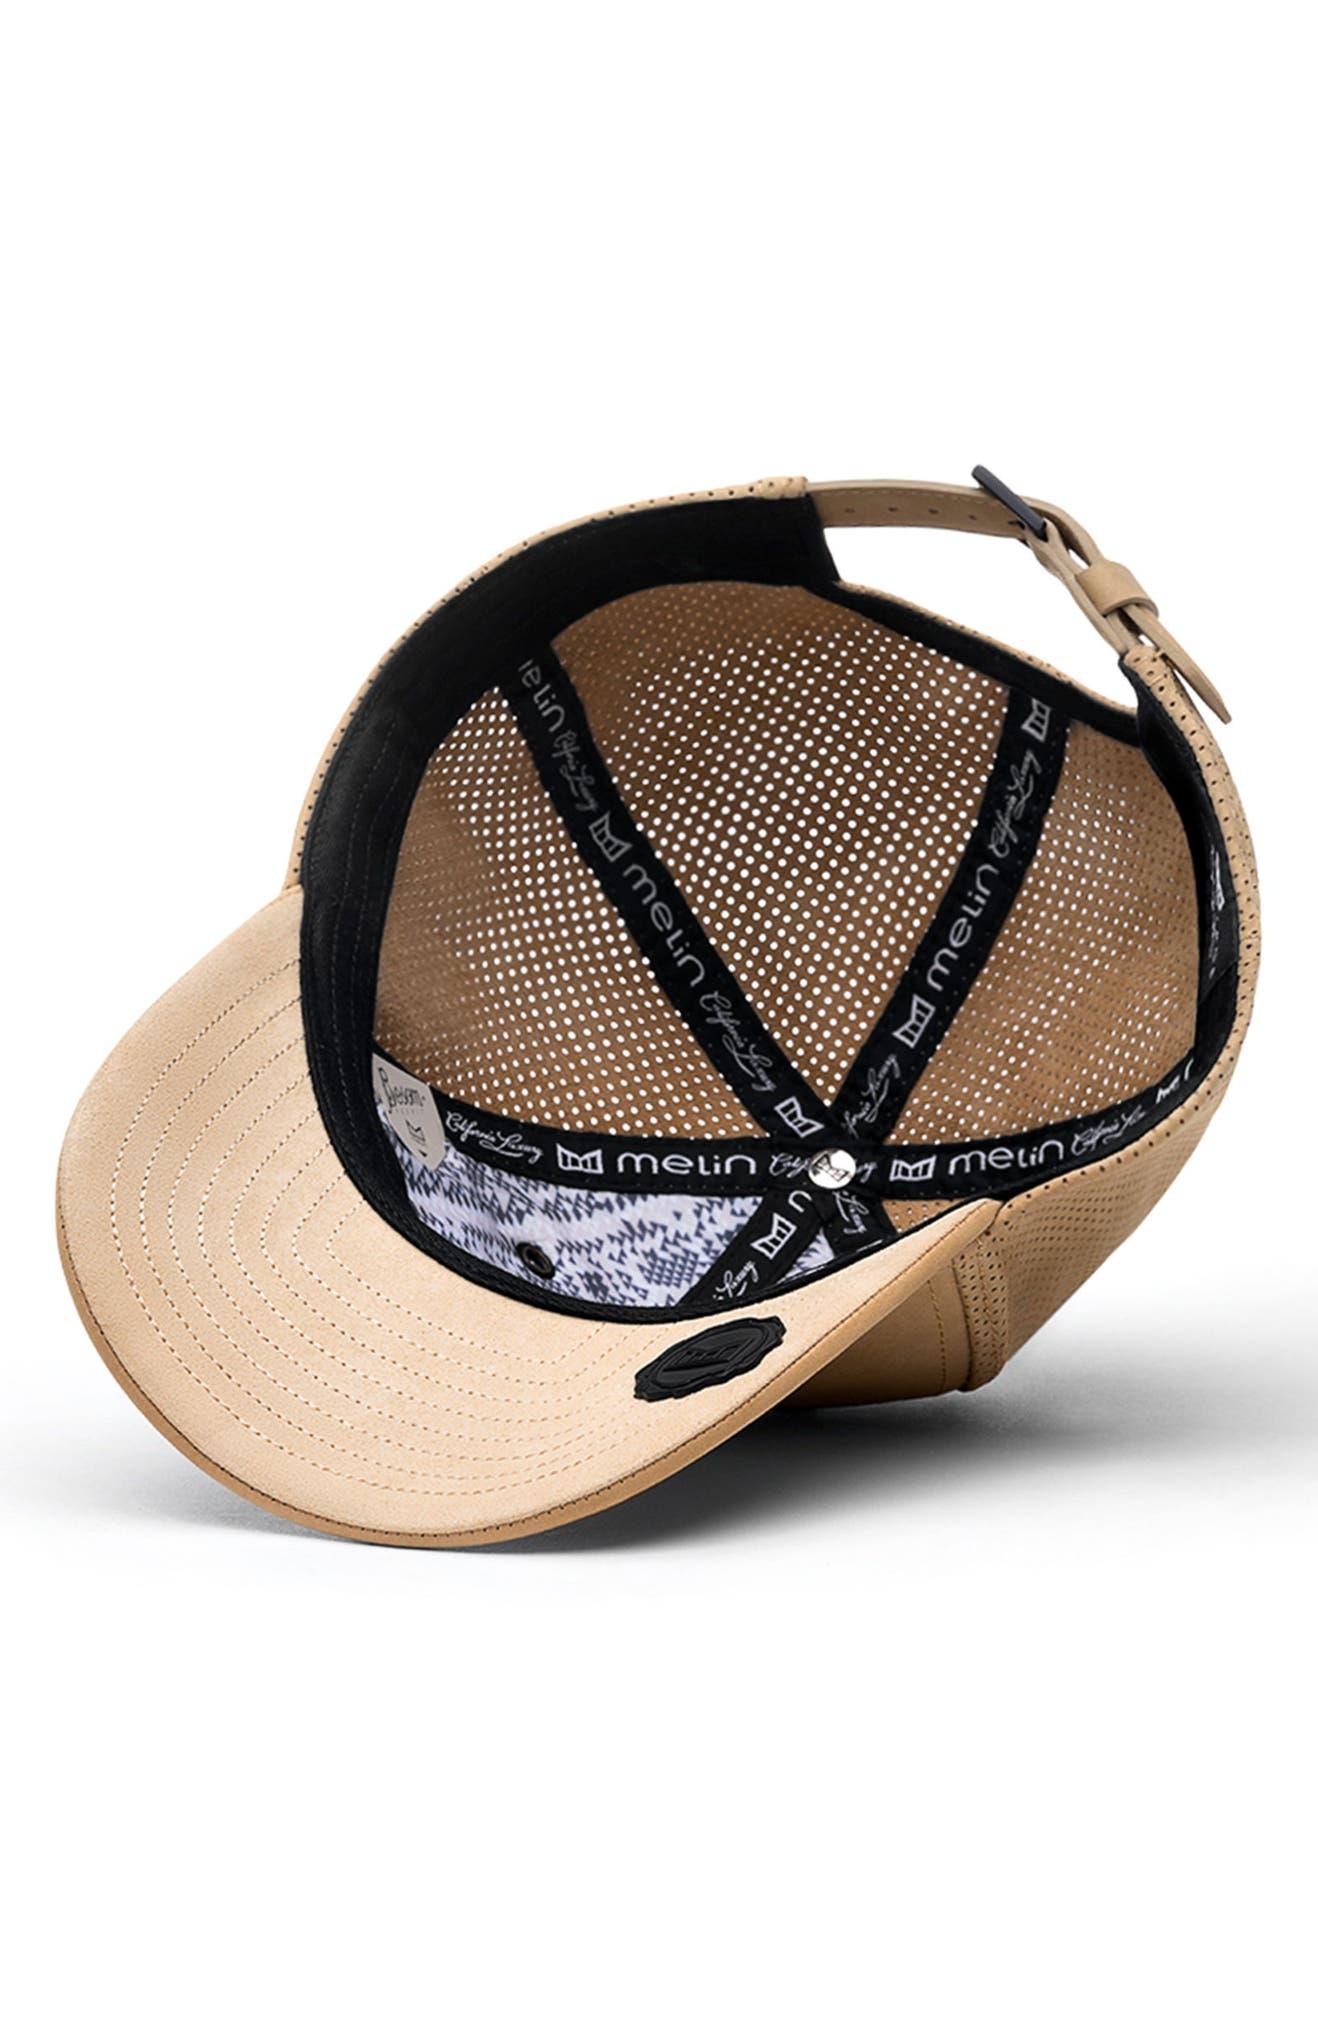 huge selection of e0926 09c32 Melin Voyage Elite Leather Ball Cap   Nordstrom